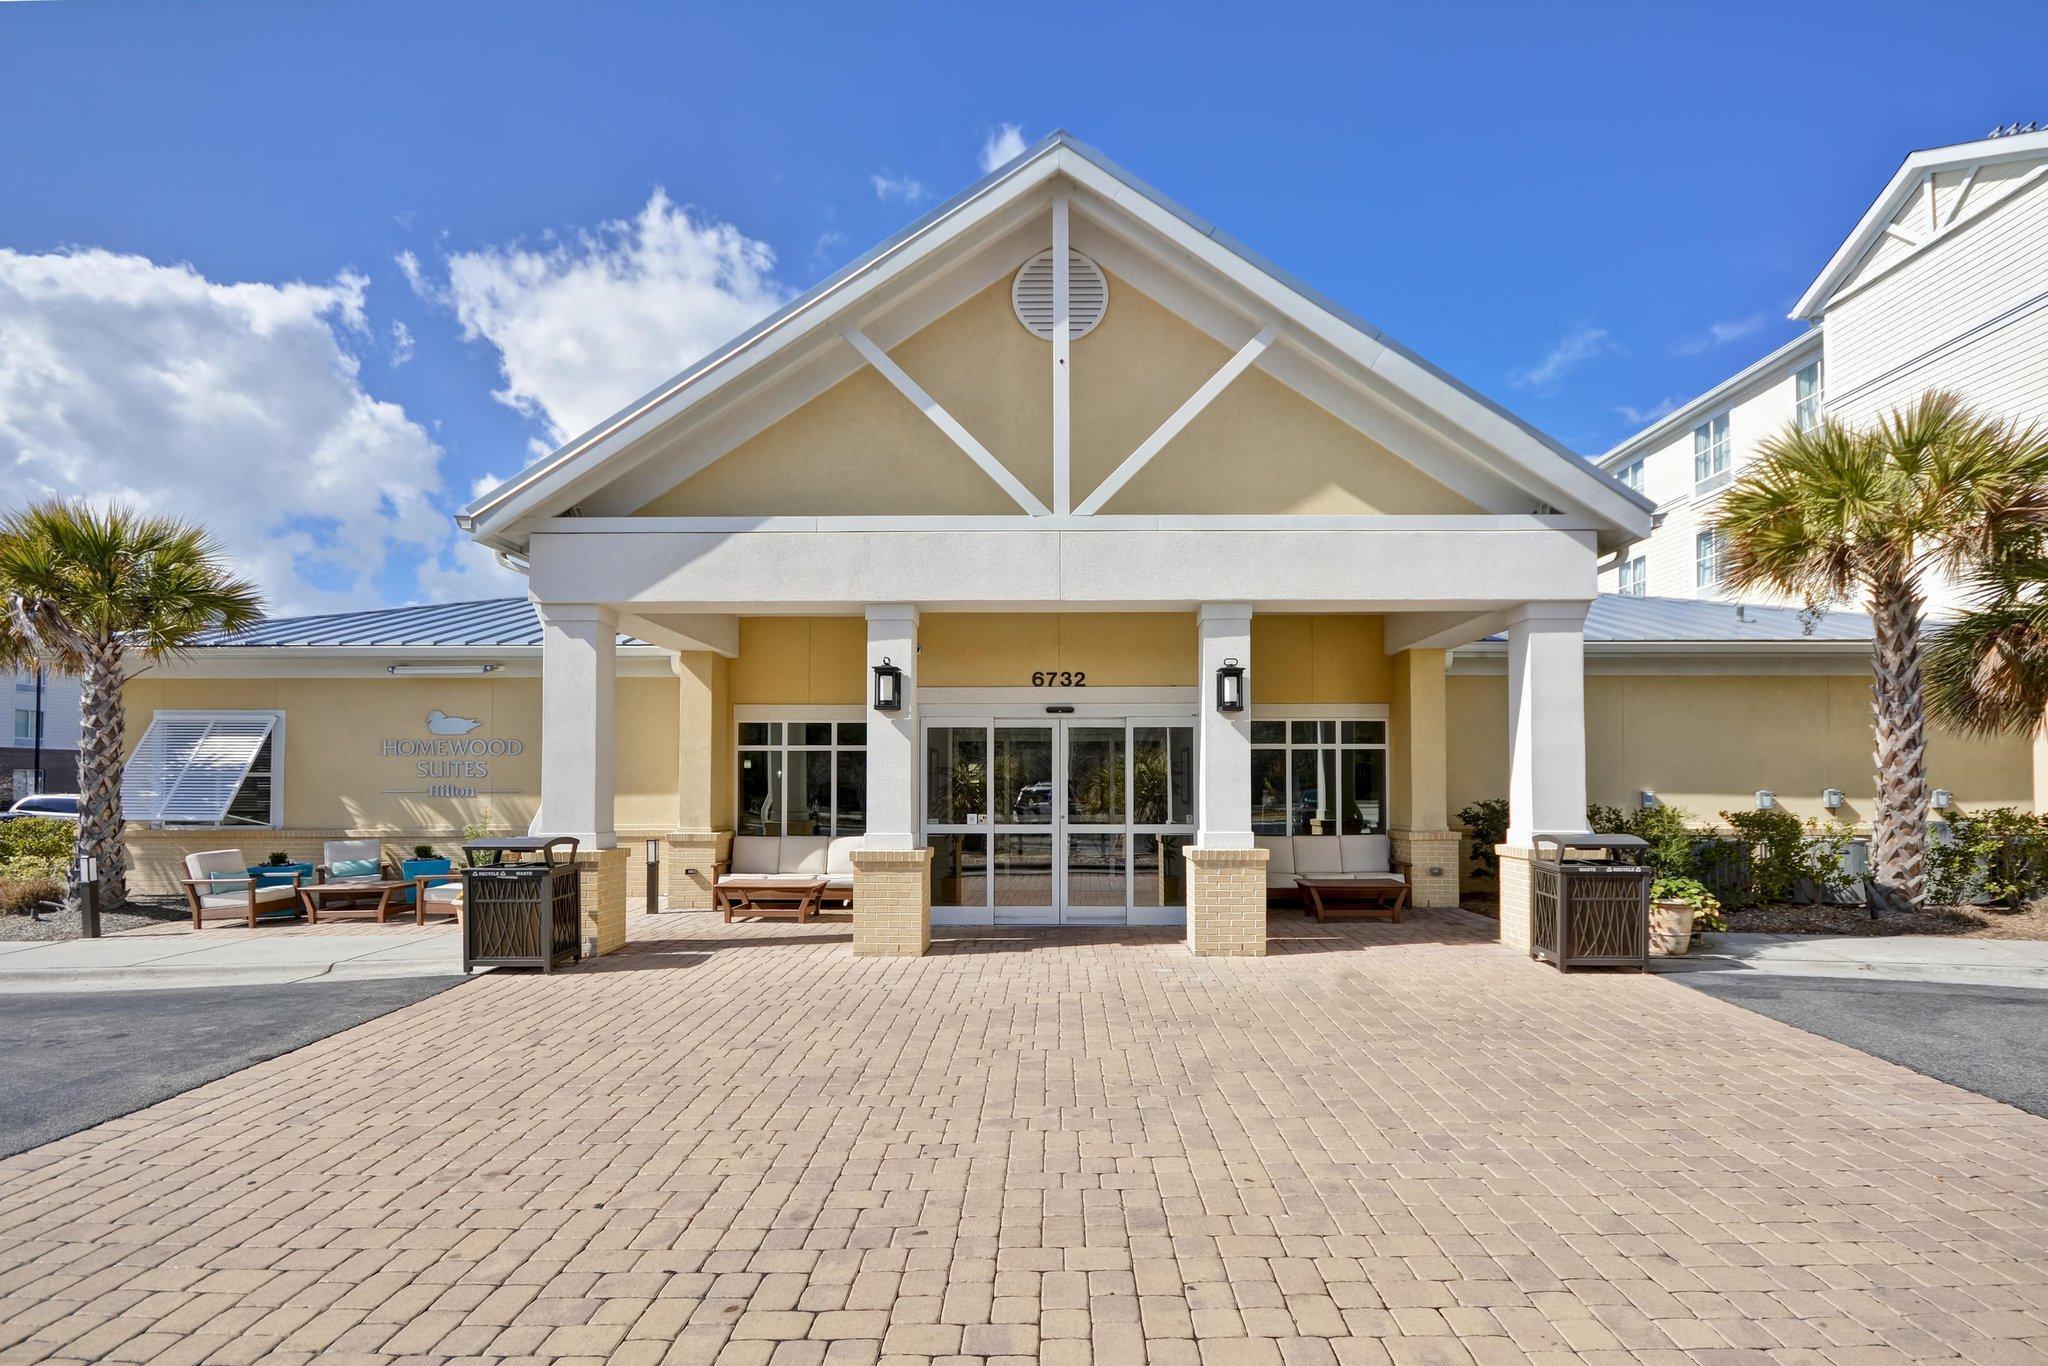 Homewood Suites By Hilton Wilmington Mayfaire